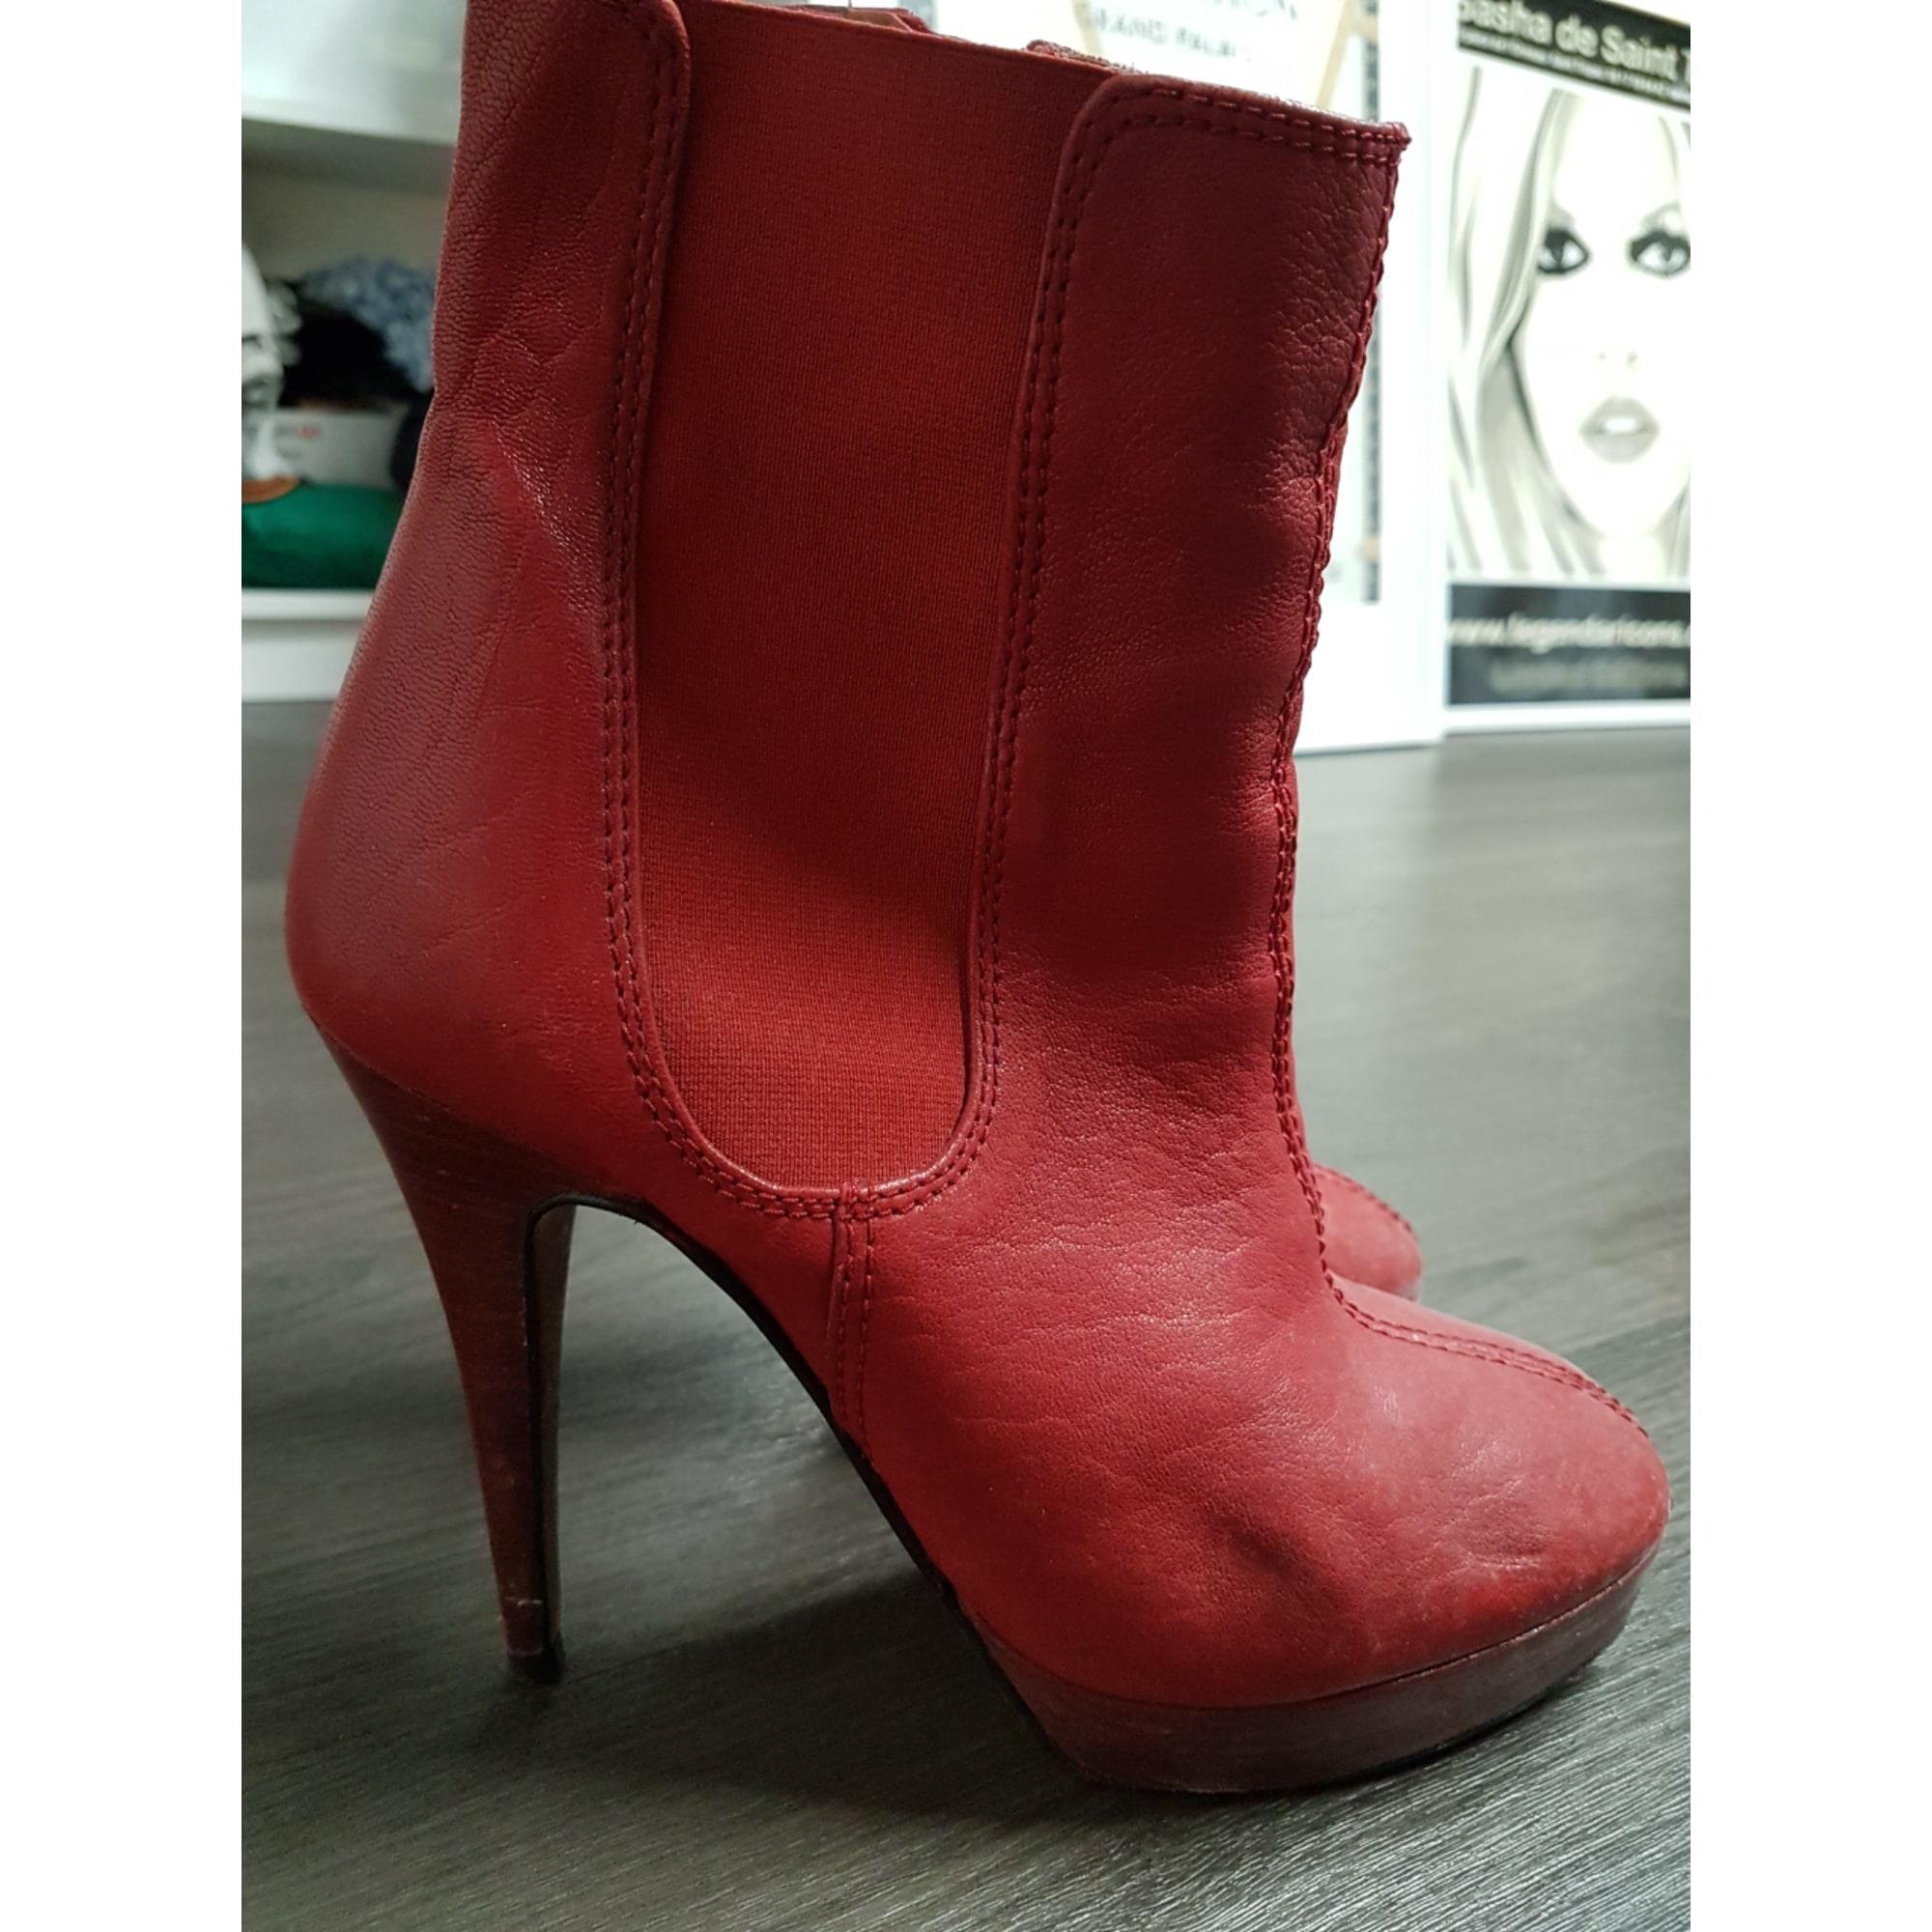 High Heel Ankle Boots ZARA Red, burgundy